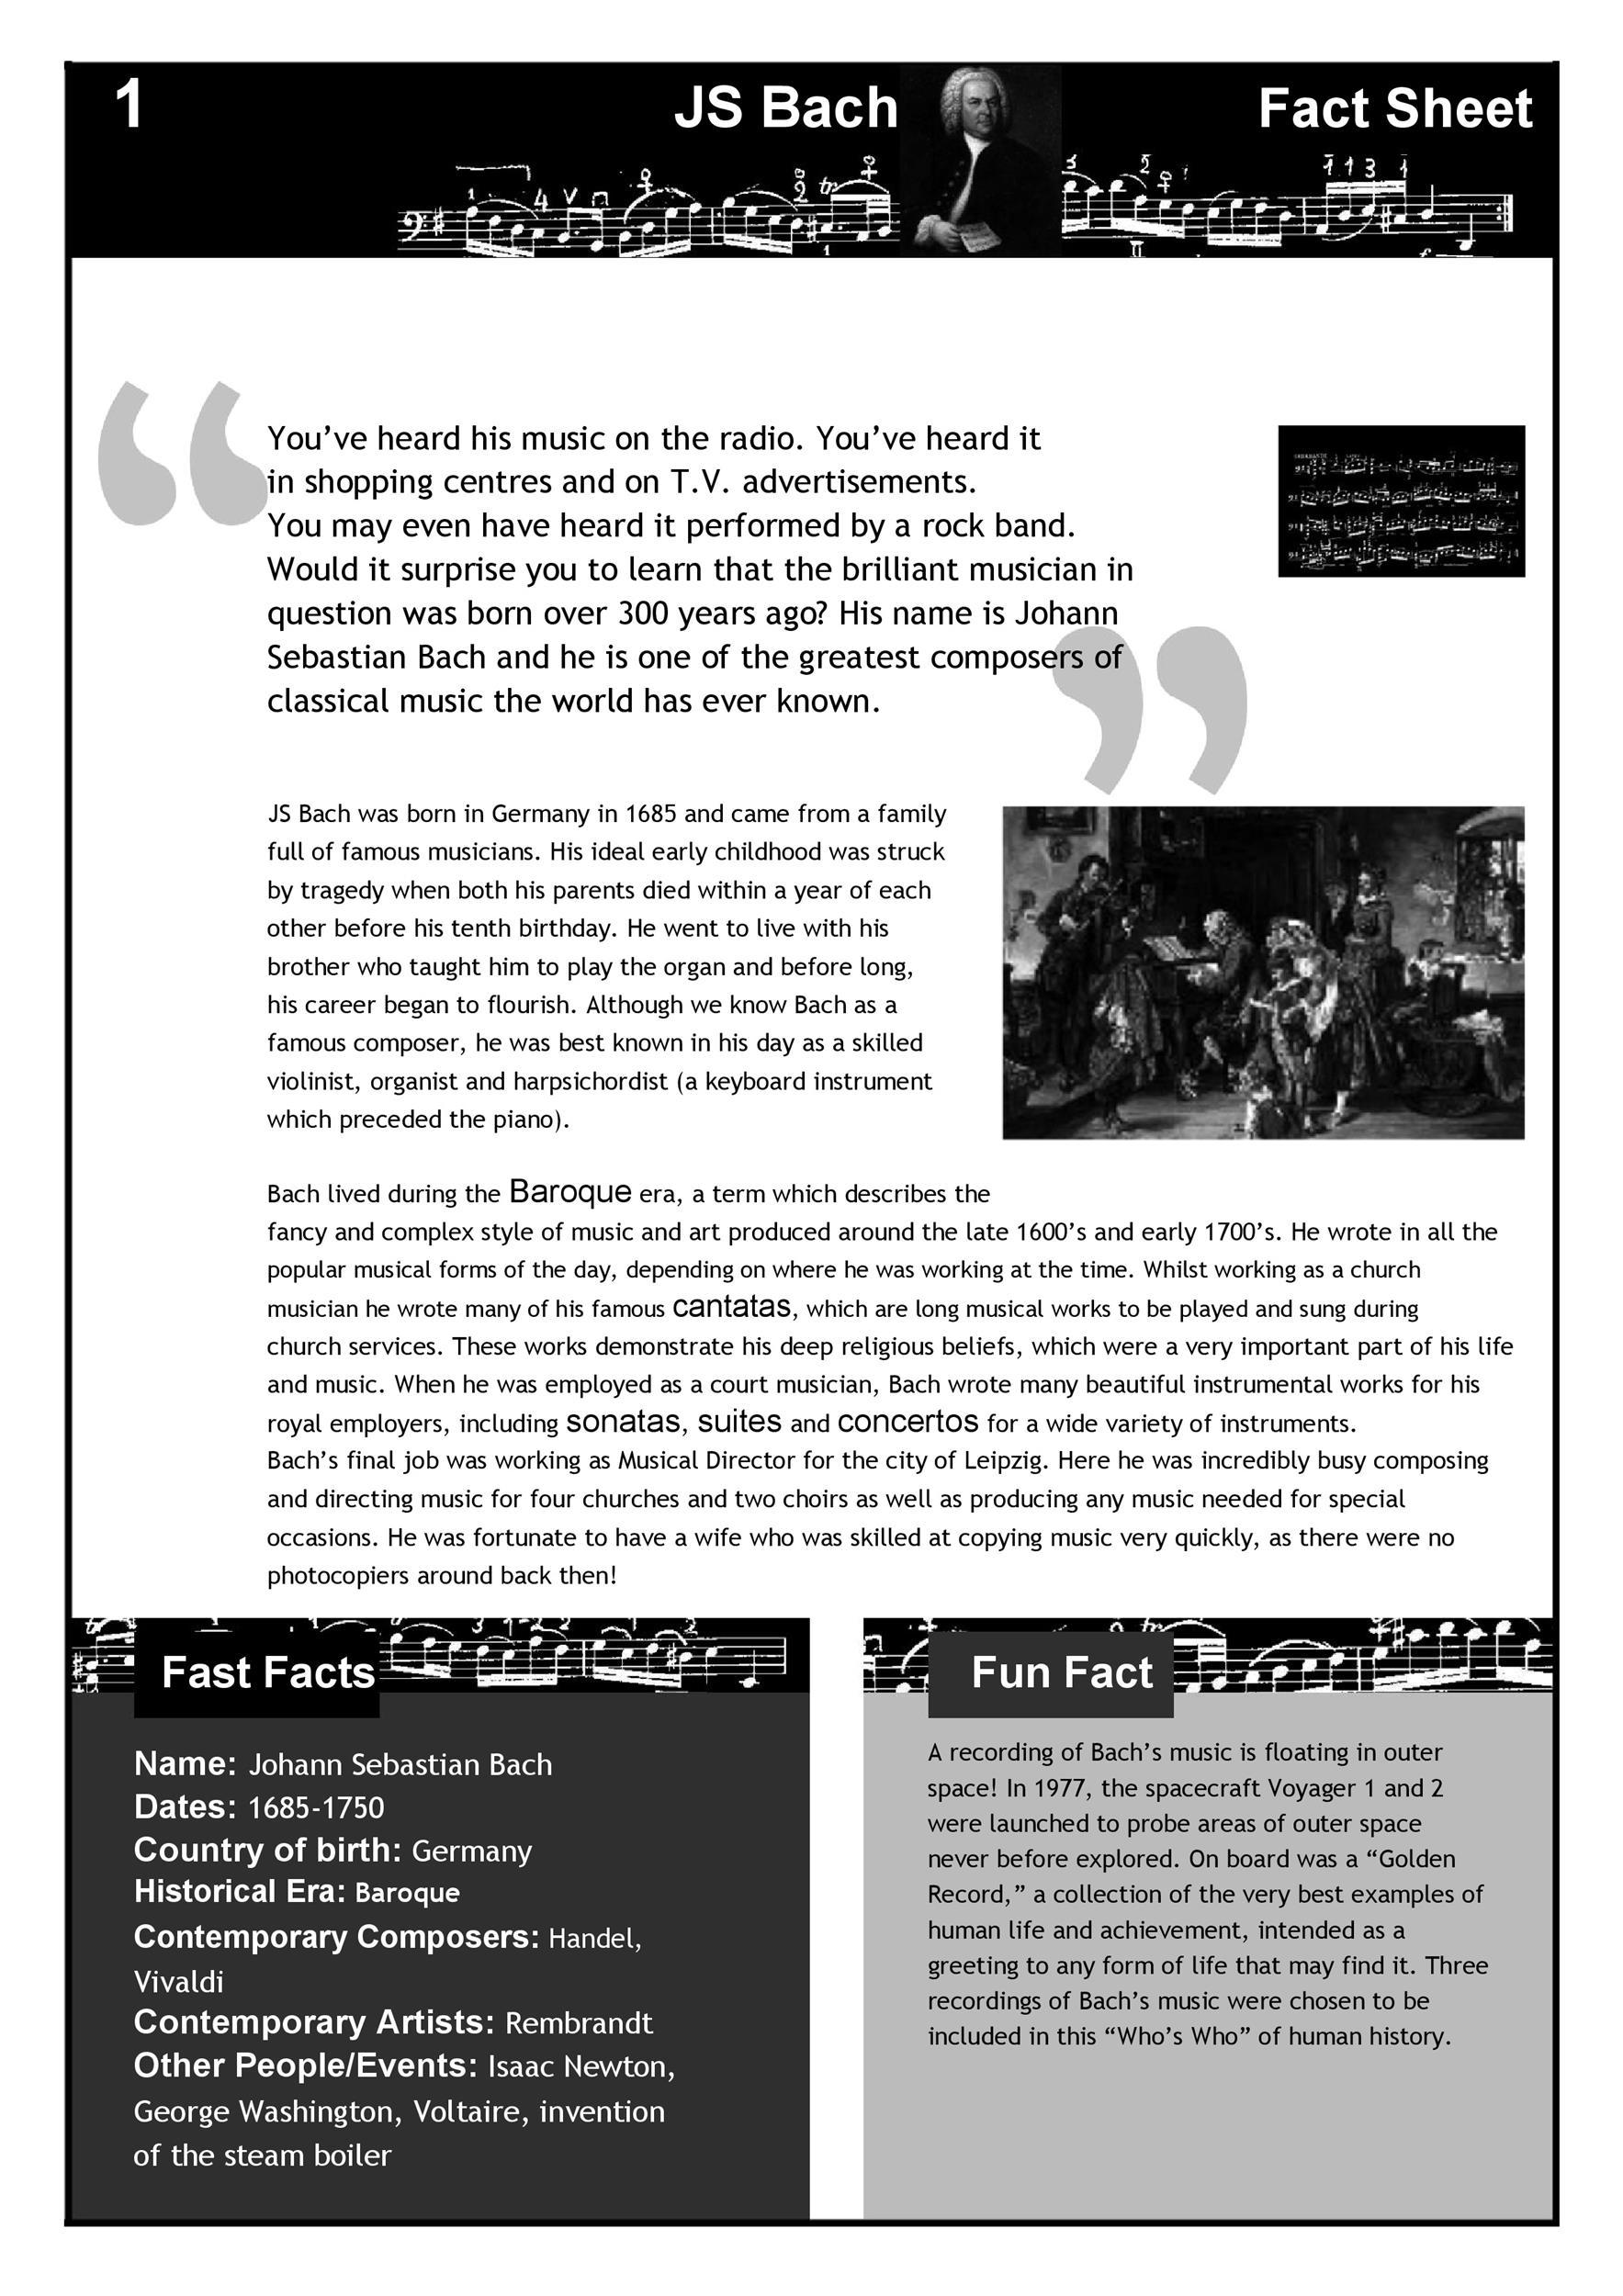 Personal Fact File Template For Children Ebooks Pdf PDF - mandegar.info